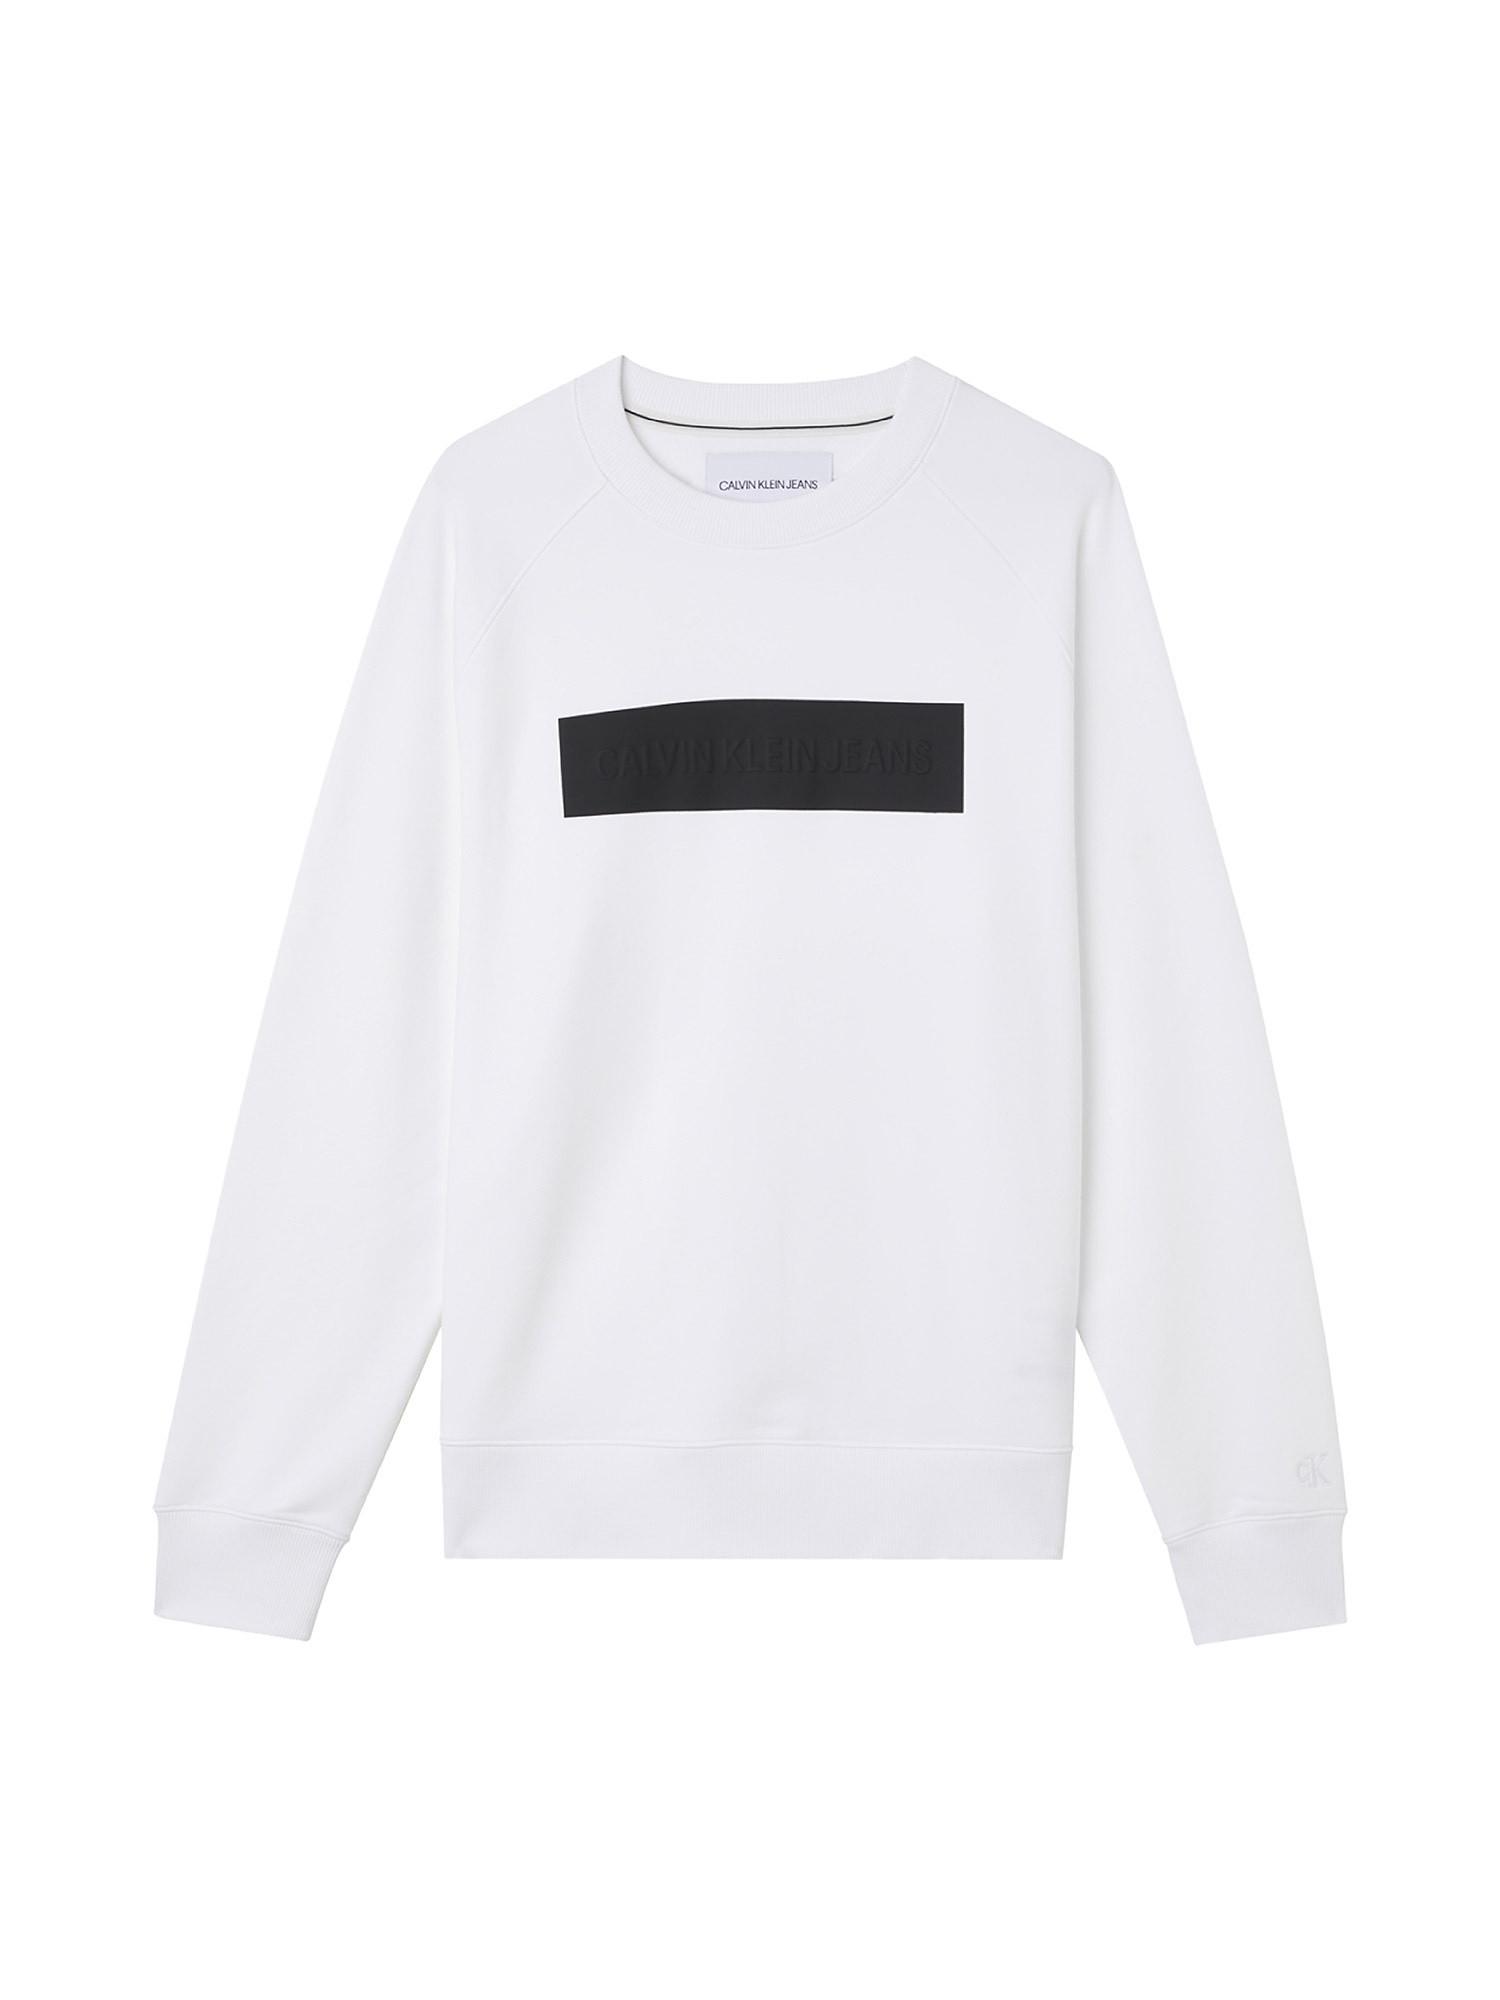 Felpa con cappuccio con logo goffrato, Bianco, large image number 0